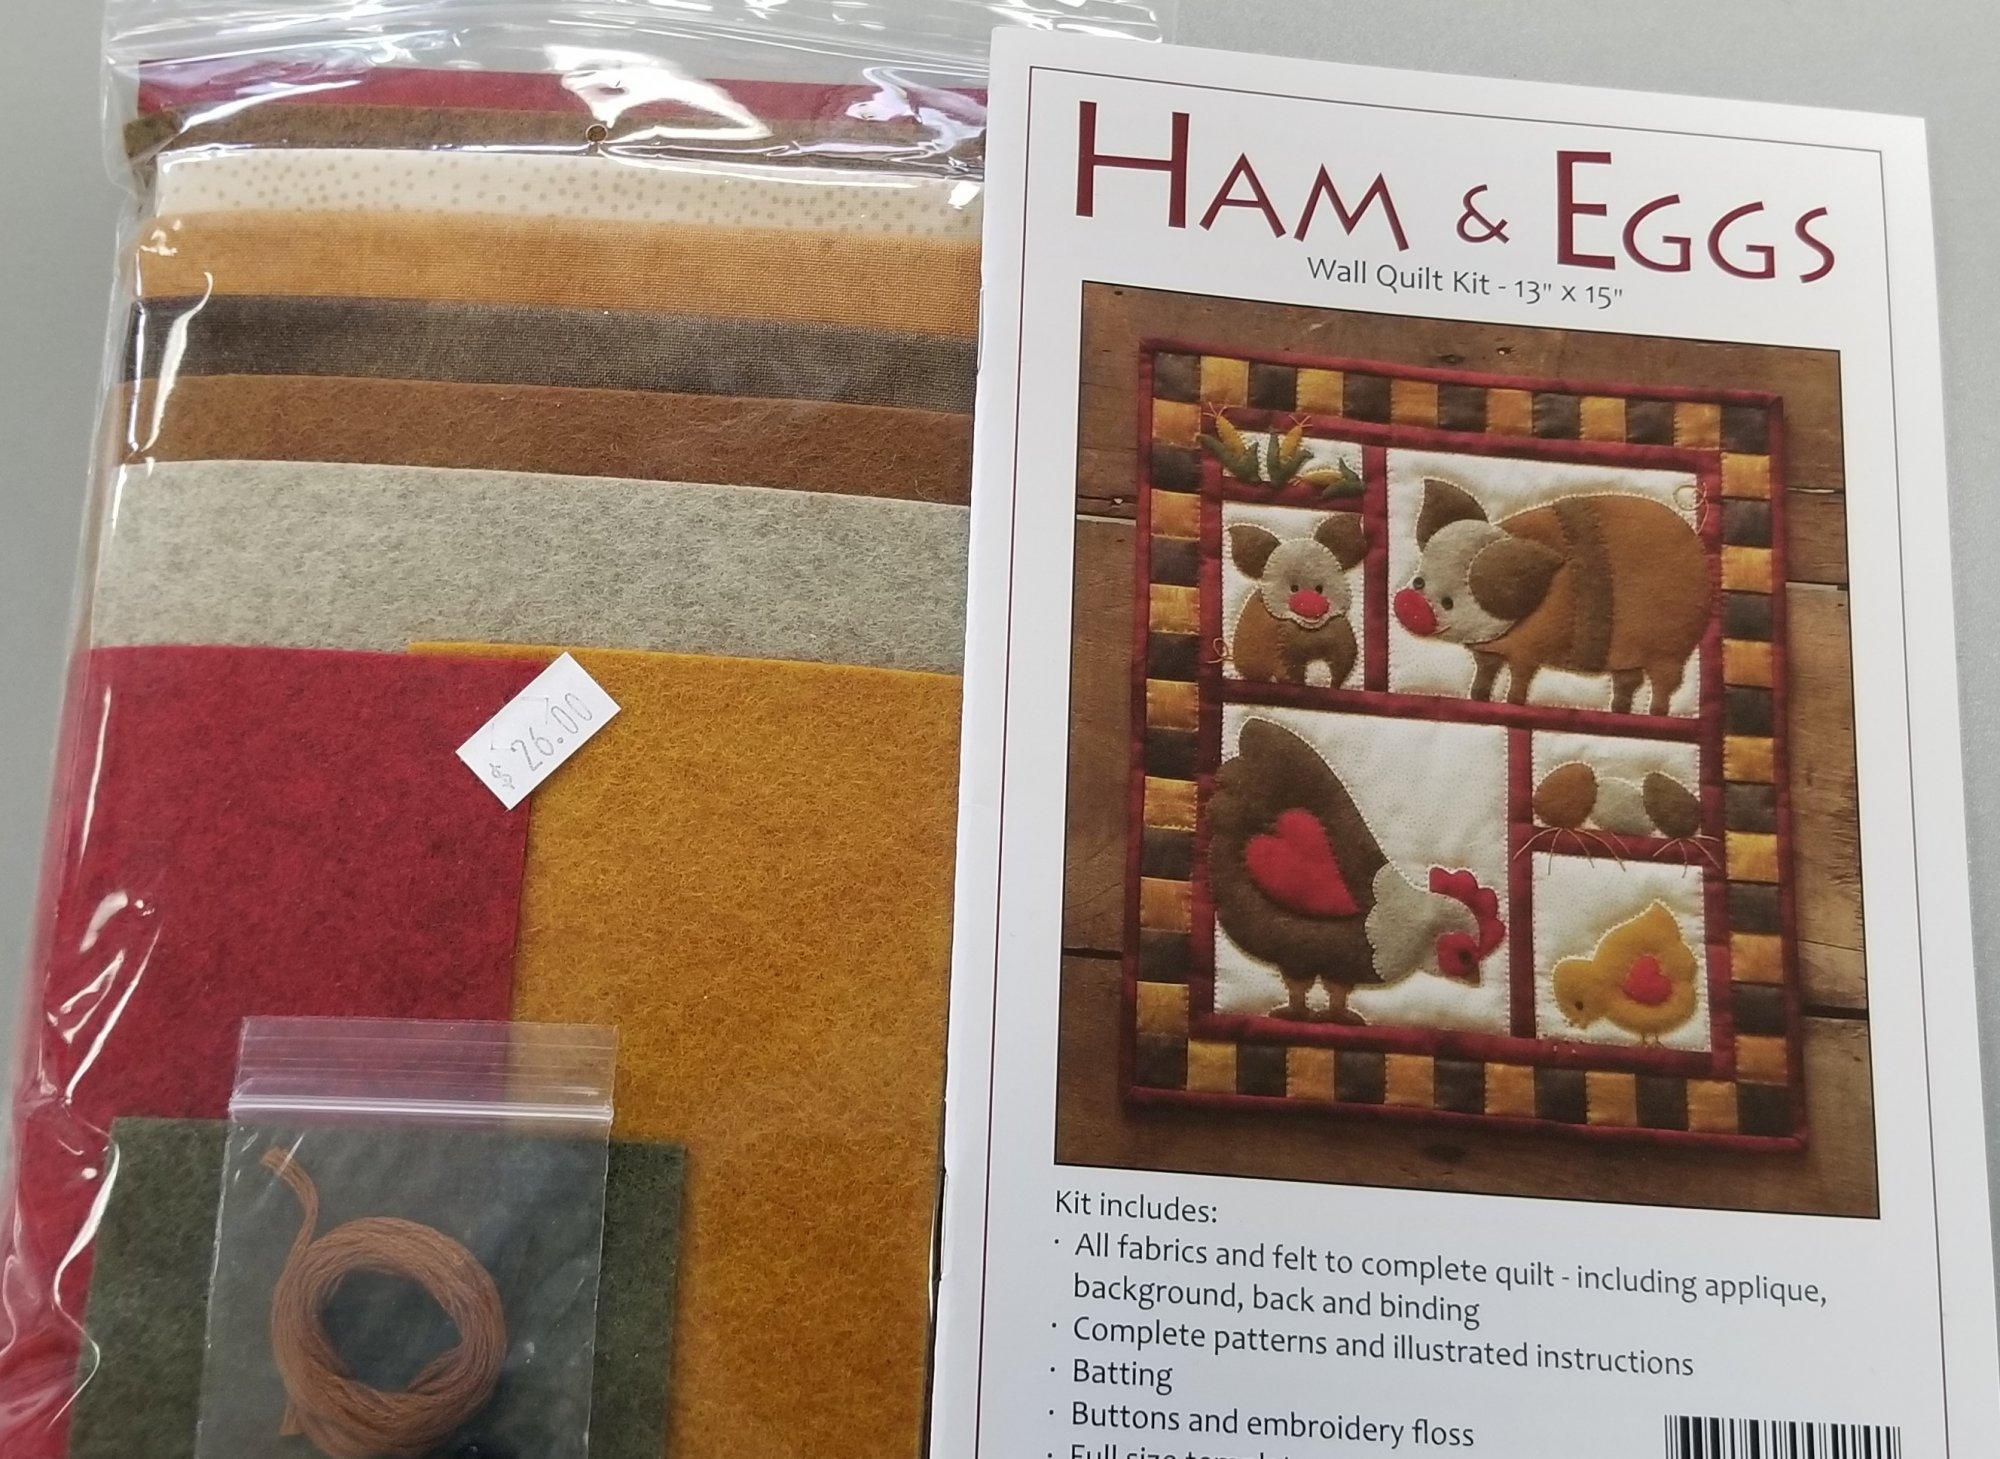 Ham & Eggs Wall Quilt Kit